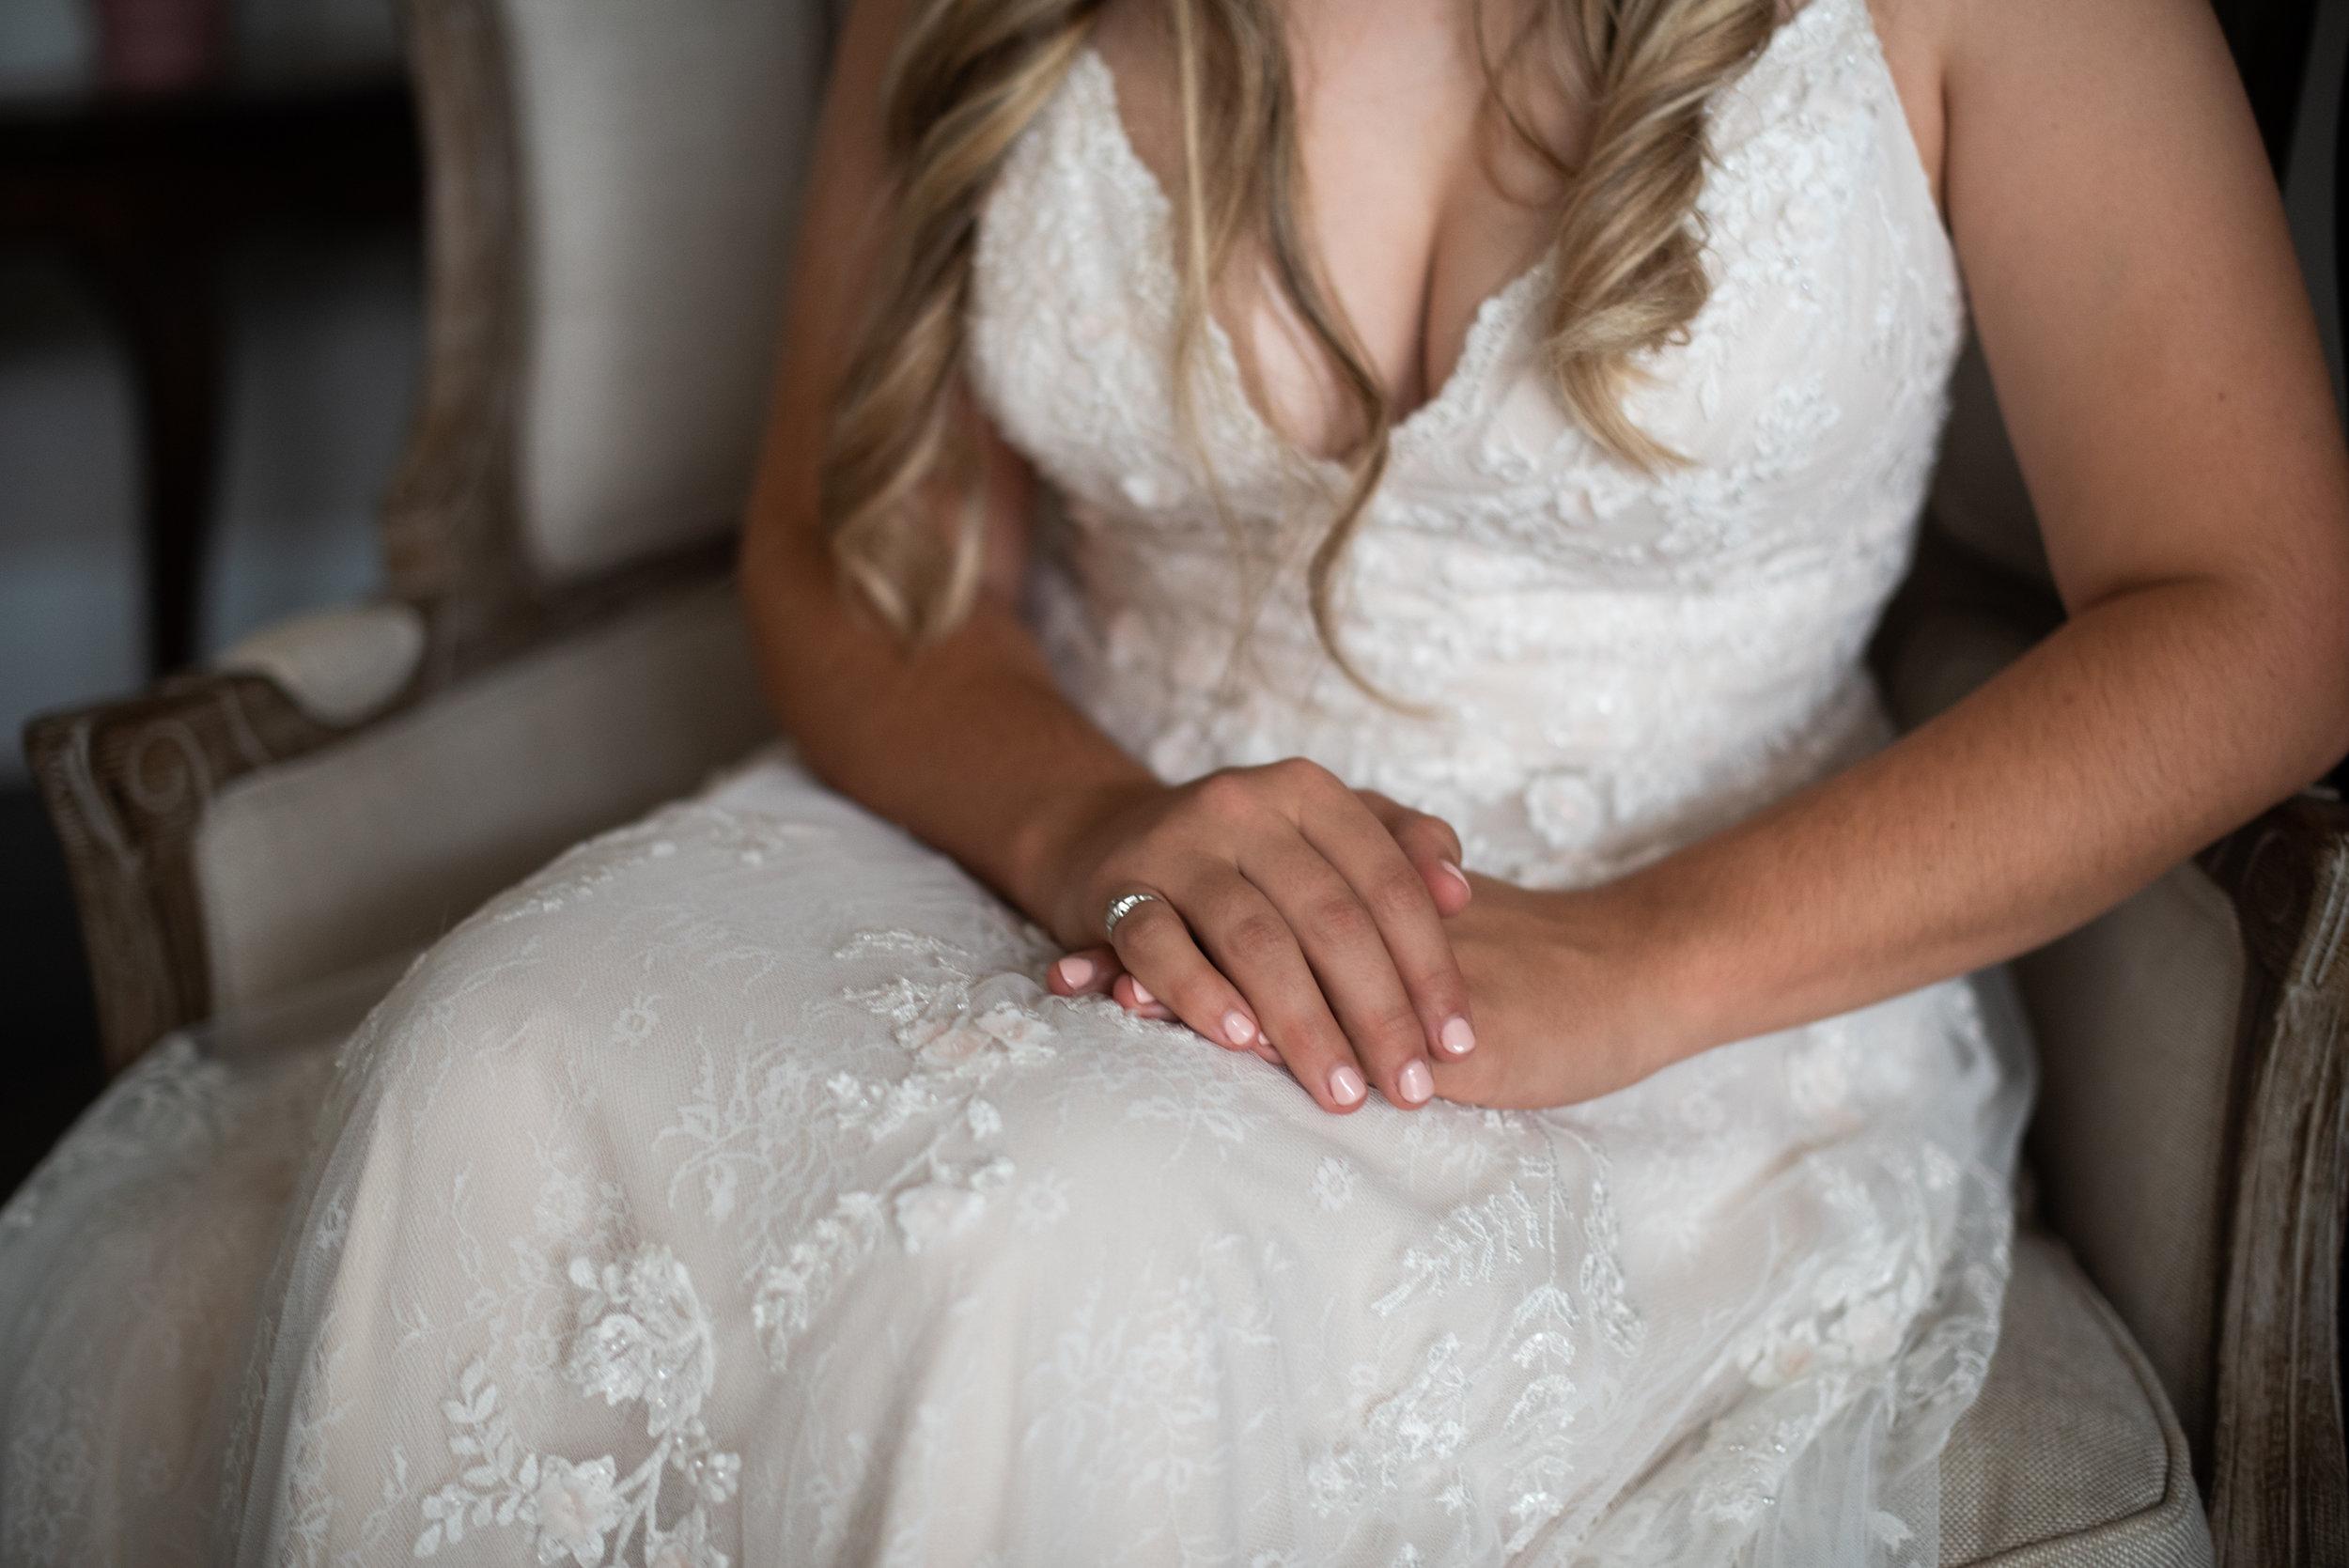 st-augustine-photographer-st-augustine-gay-wedding-sam-sex-wedding-photographer-sarah-annay-photography-white-room-weddings-10.jpg